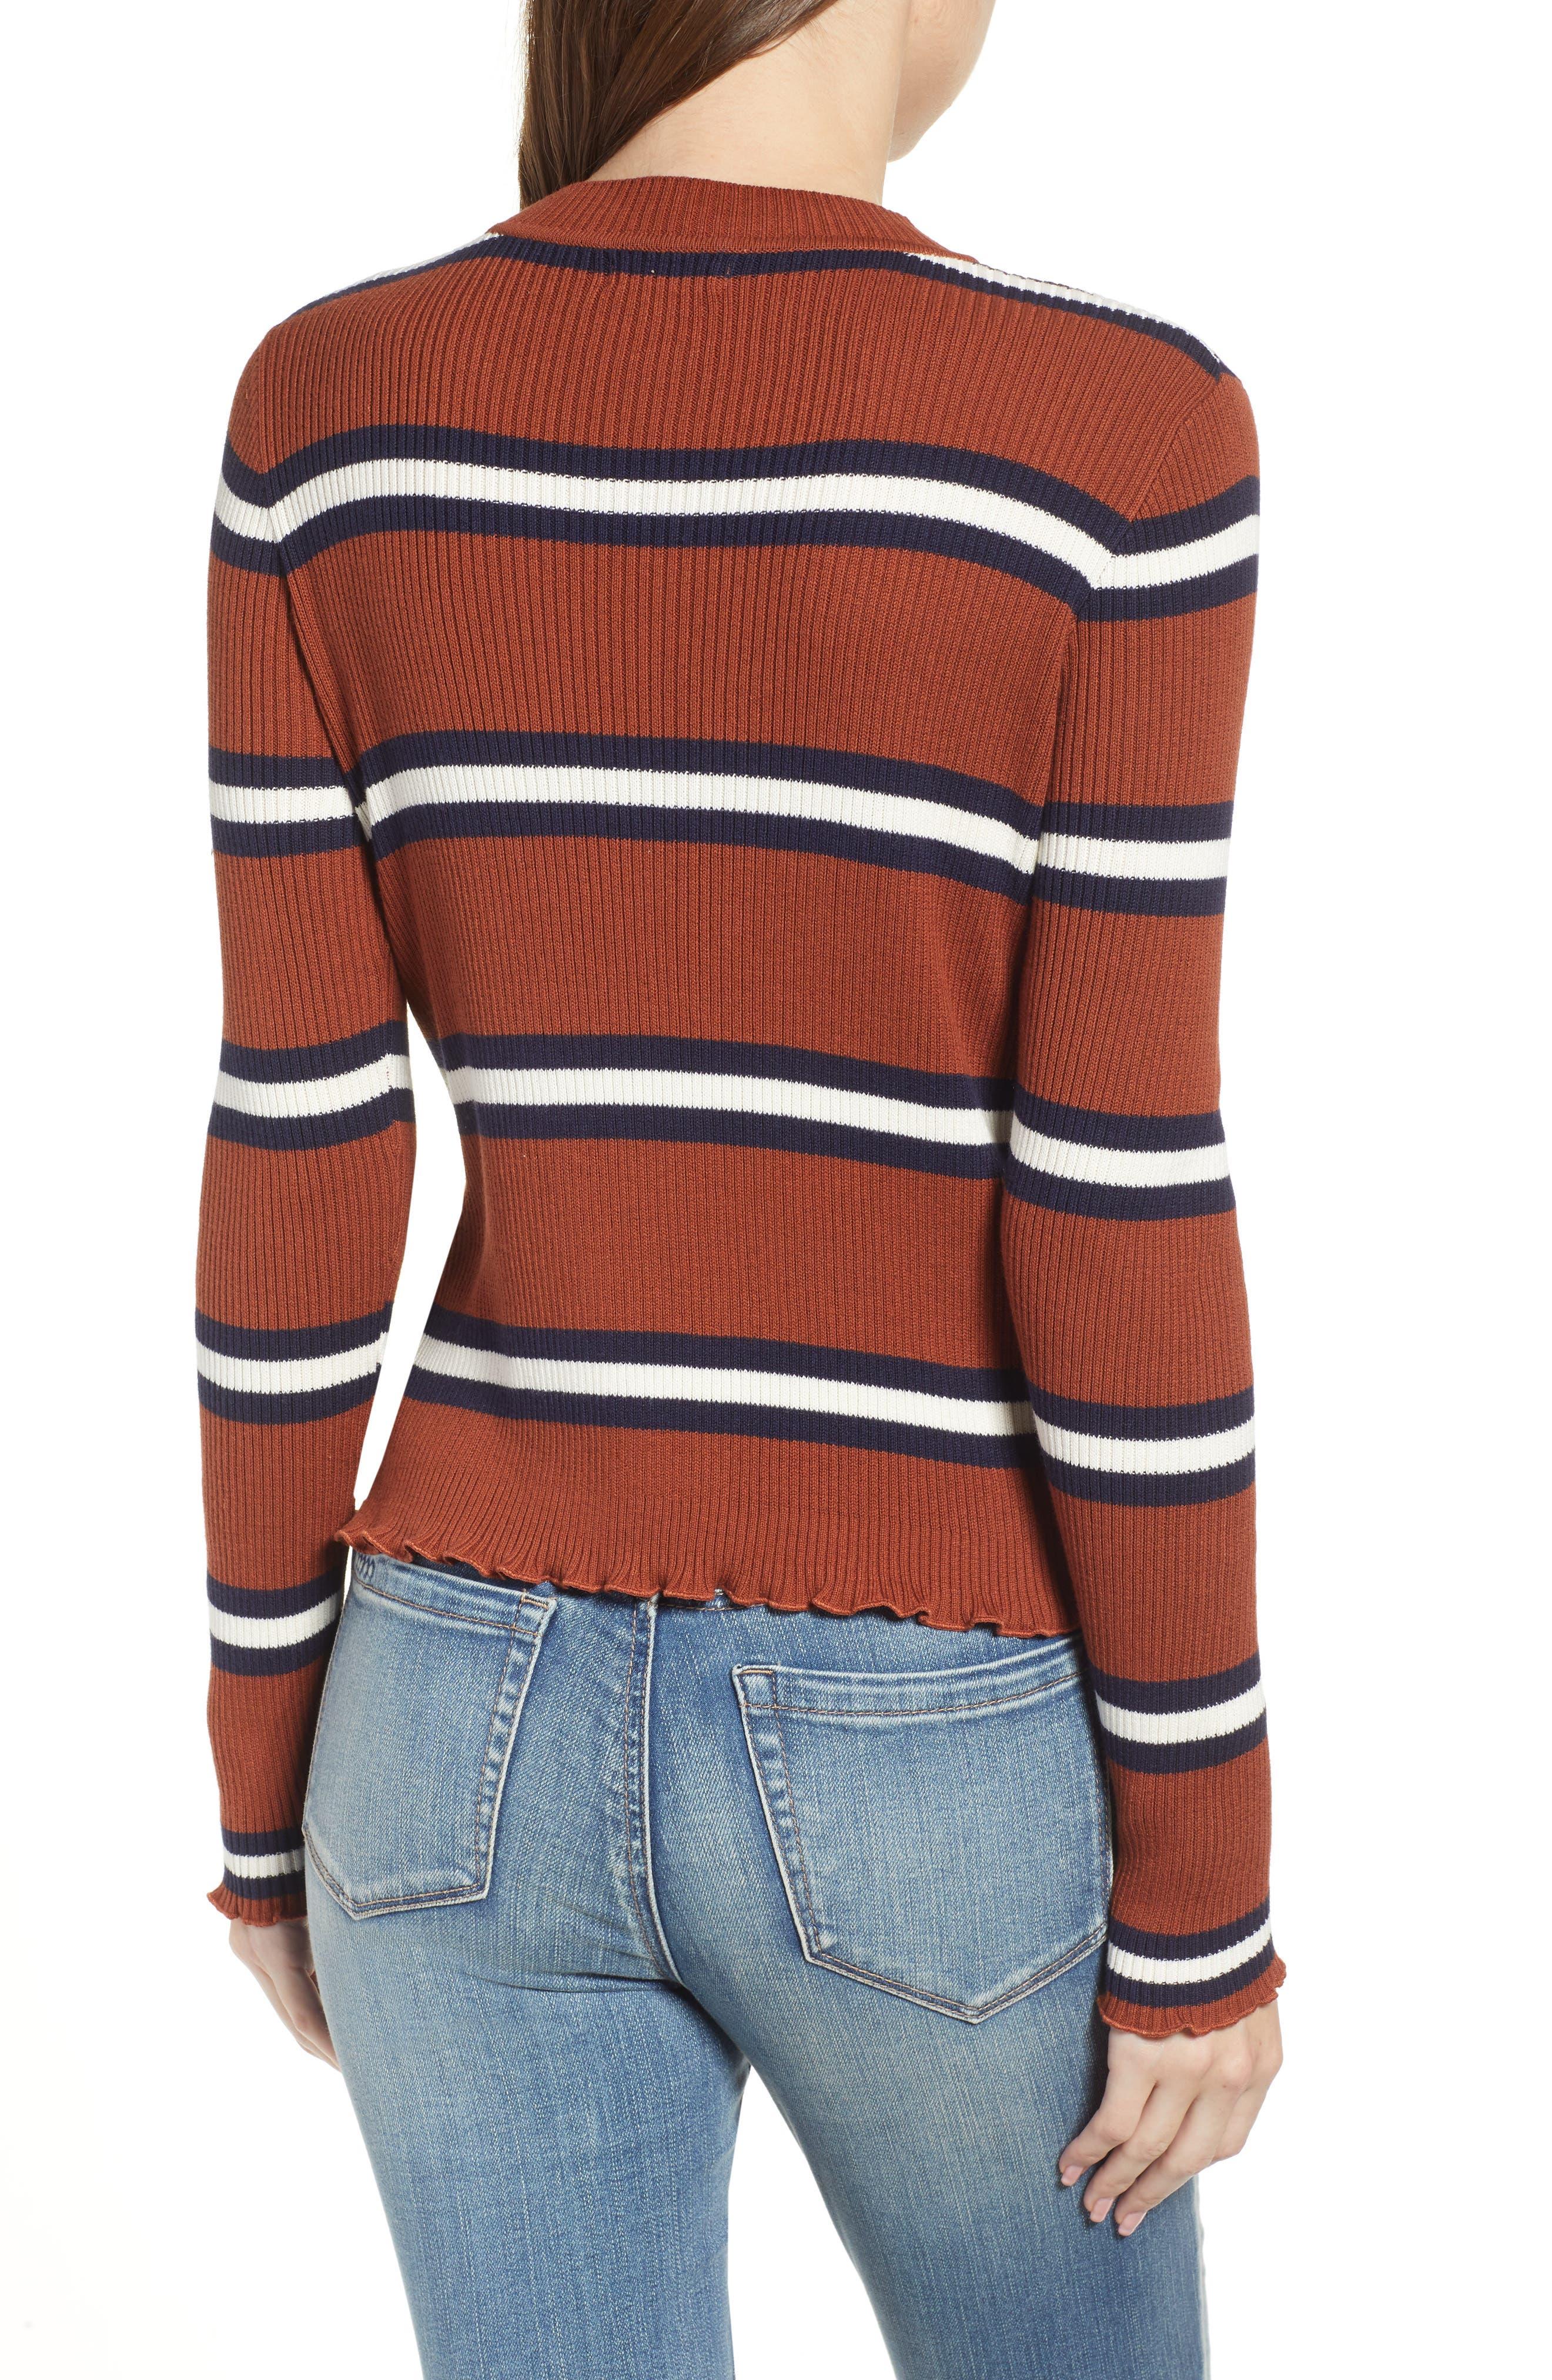 Ribbed Lettuce Edge Stripe Sweater,                             Alternate thumbnail 2, color,                             RUST SEQUOIA CLEO STRIPE